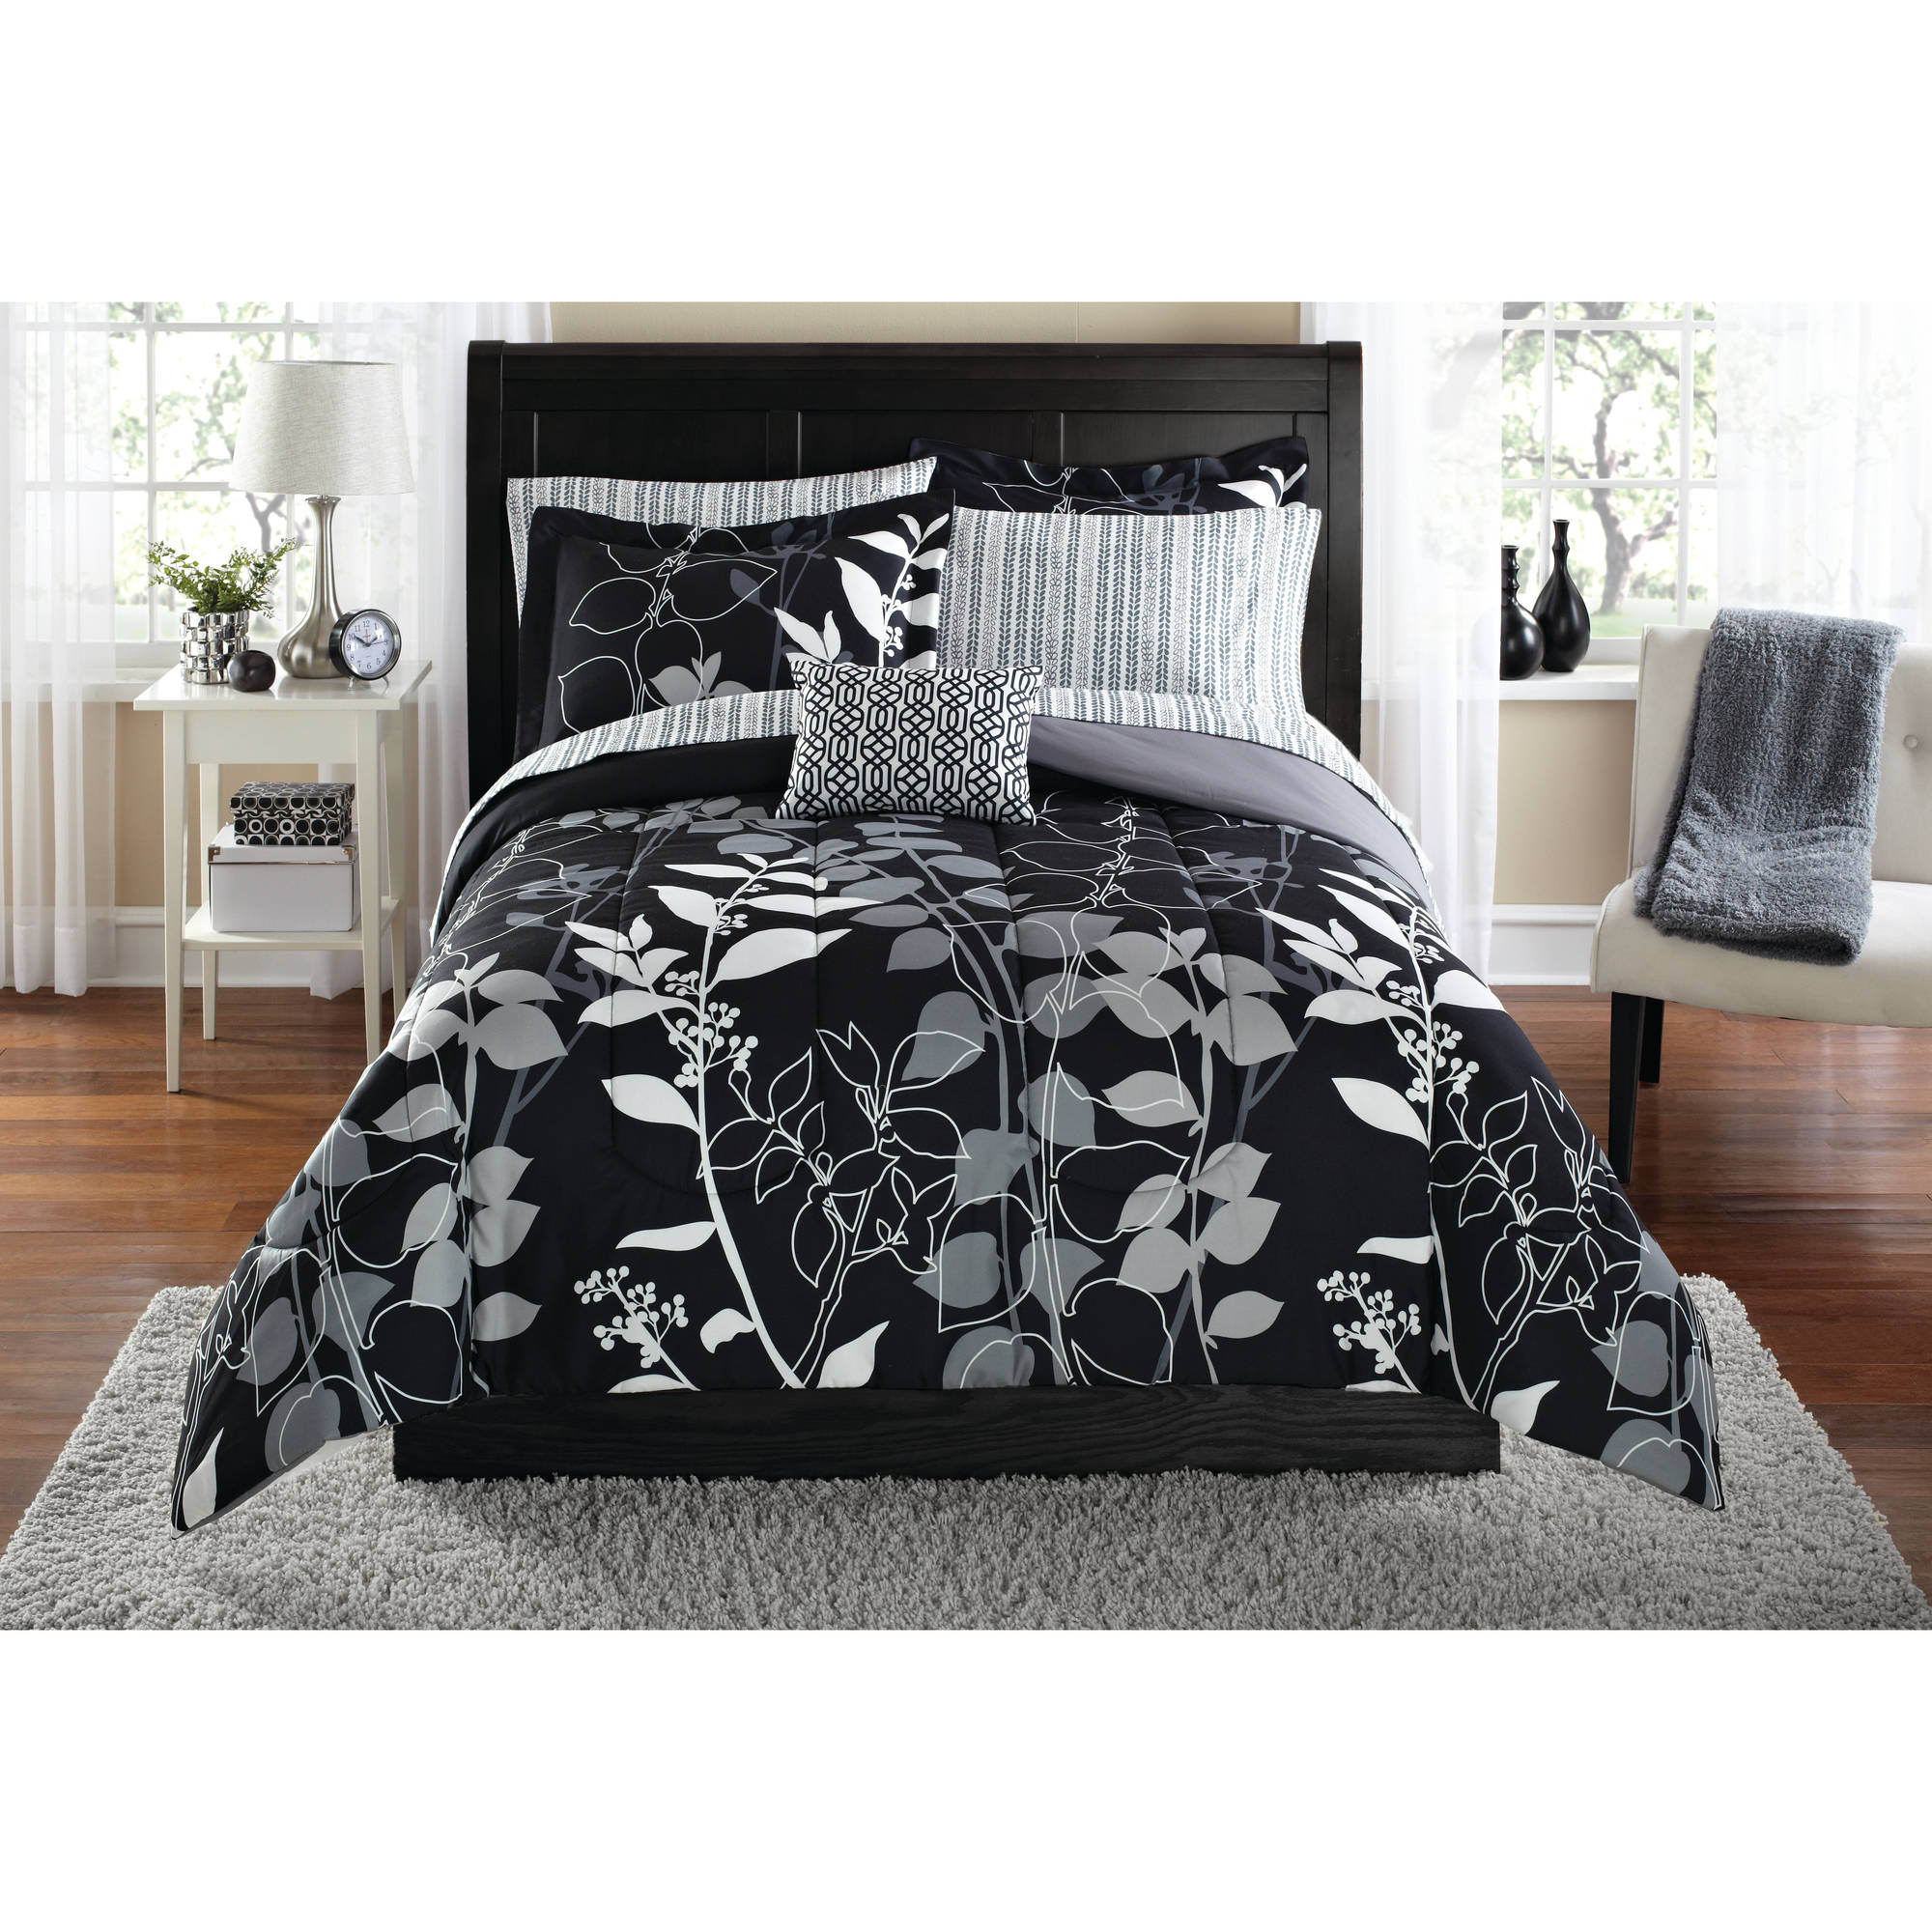 Mainstays Orkasi Bed In A Bag Coordinated Bedding Set Walmartcom